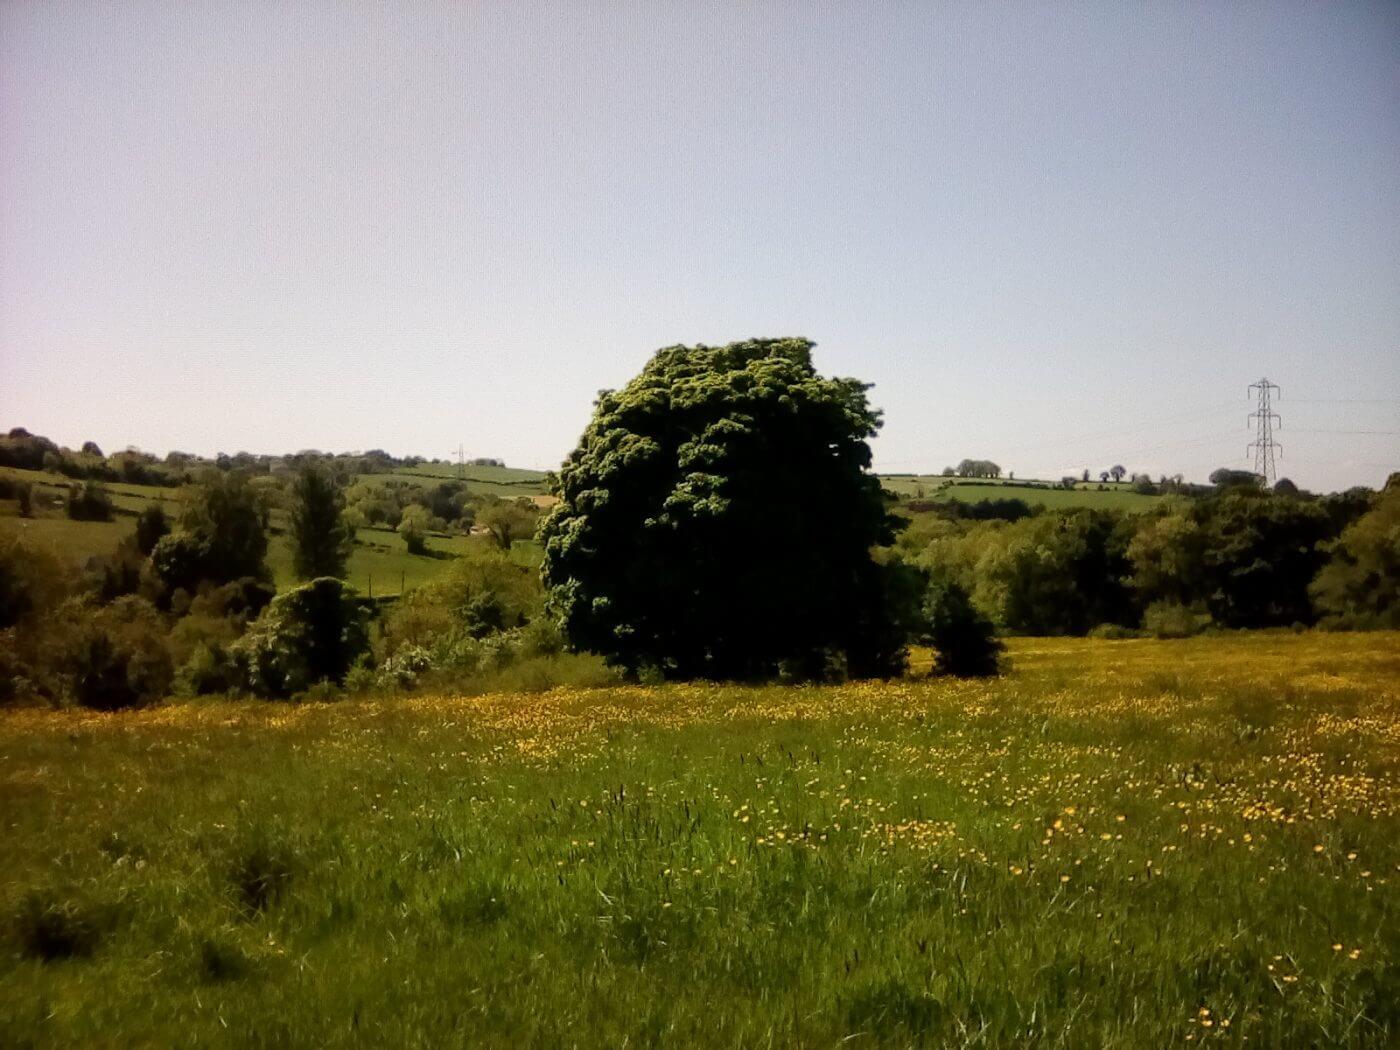 Archos 80b Tree